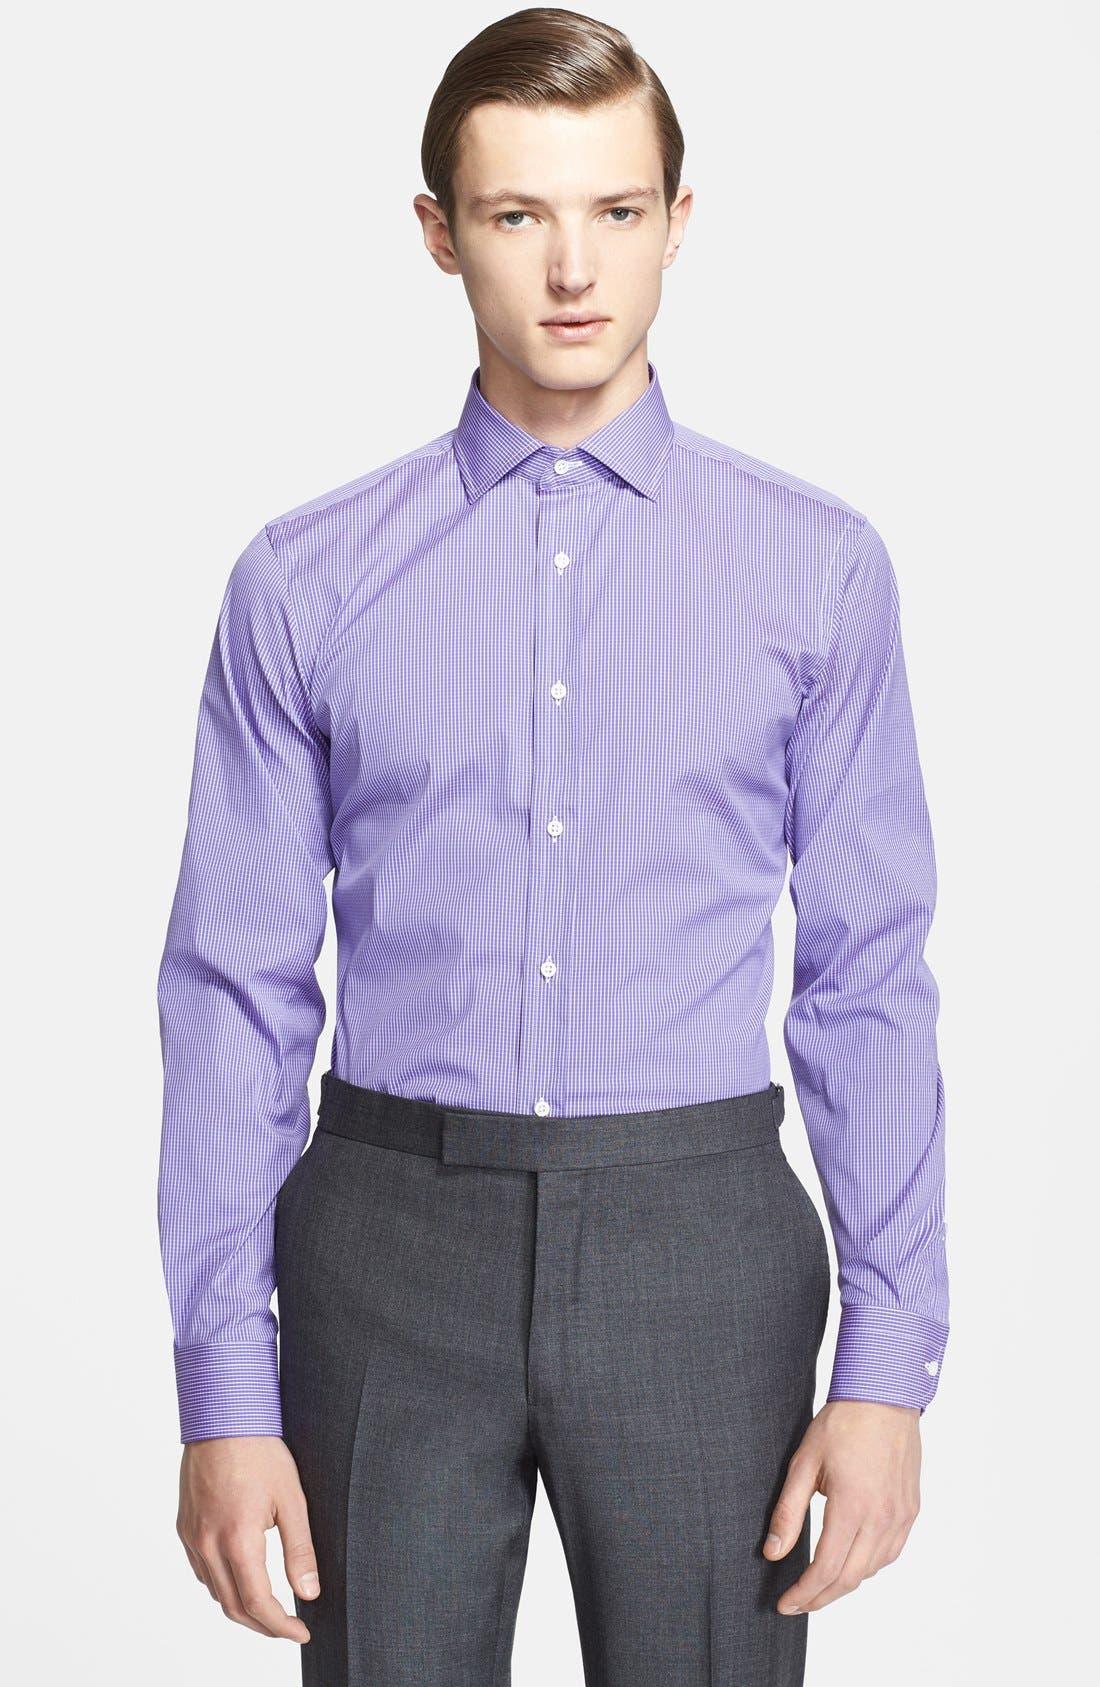 Alternate Image 1 Selected - Ralph Lauren Black Label Trim Fit Stripe Dress Shirt